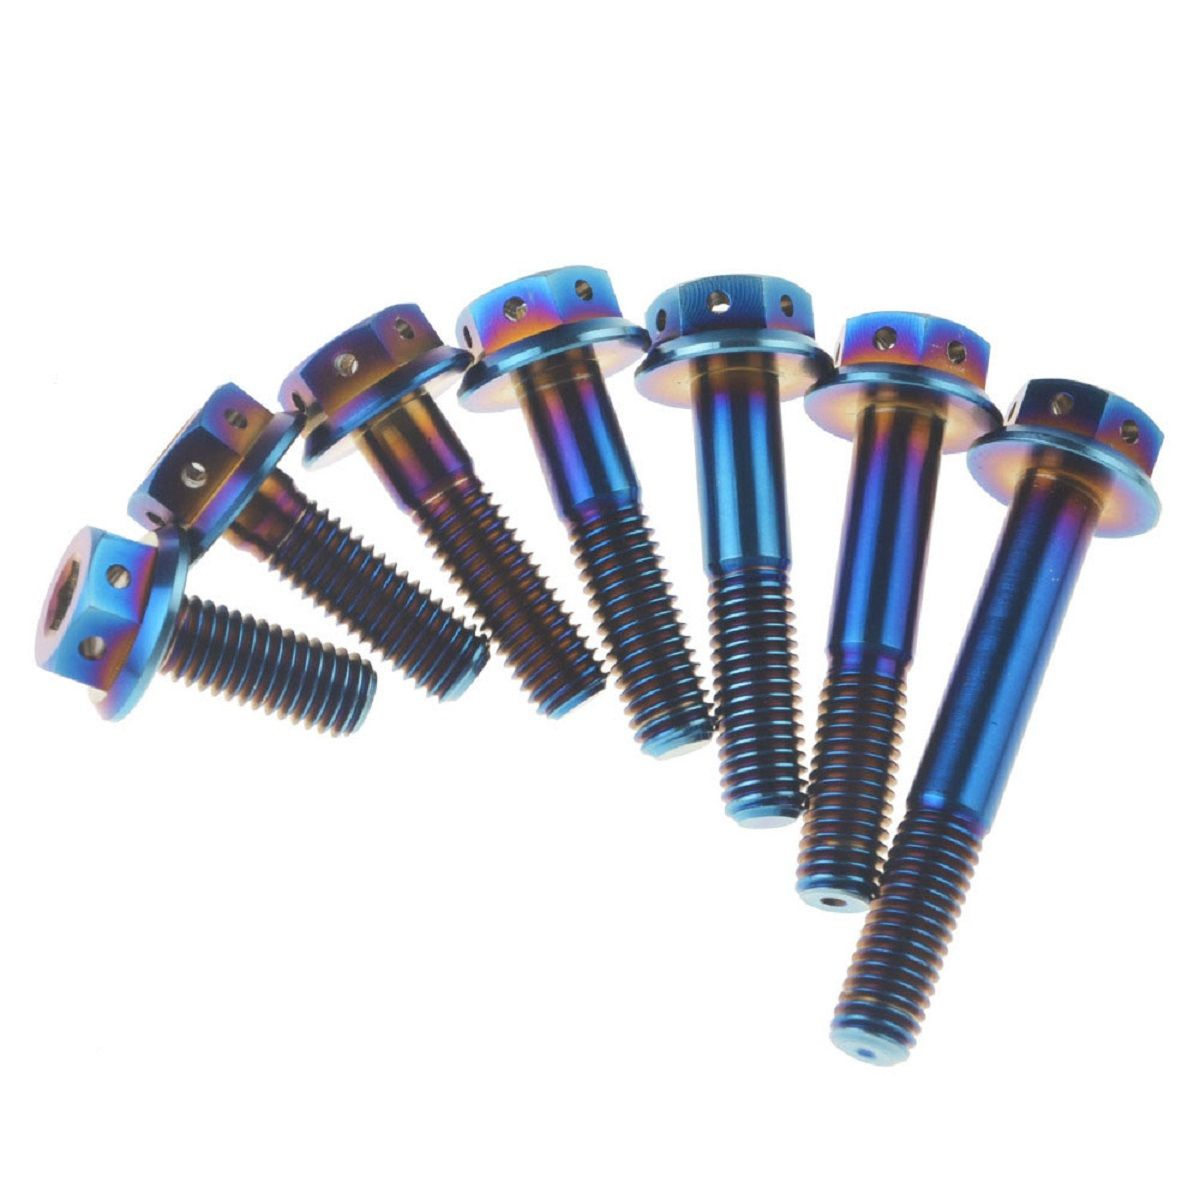 Blue M10 x 1.25 x 35 Titanium Ti Screw Bolt Socket Cap Hexagon Hex Flange Head